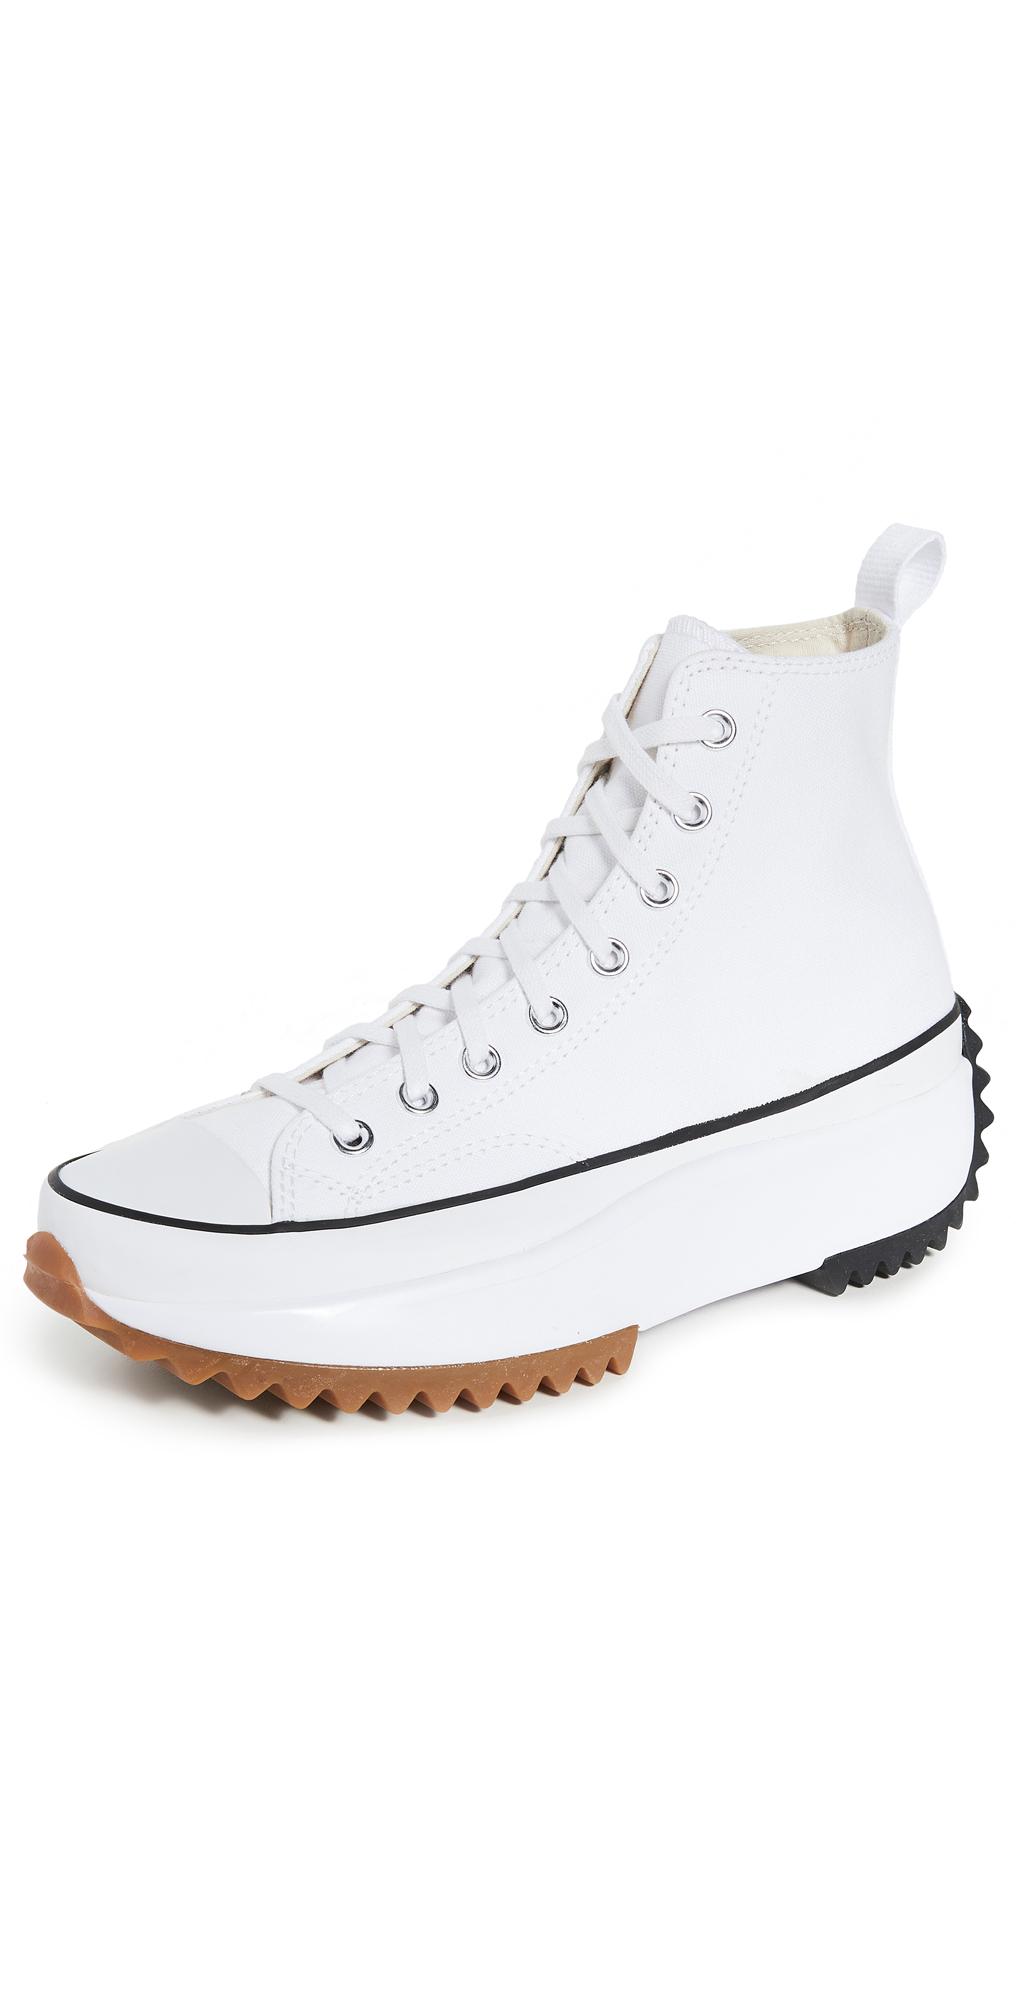 Converse Run Star Hike Hightop Sneakers